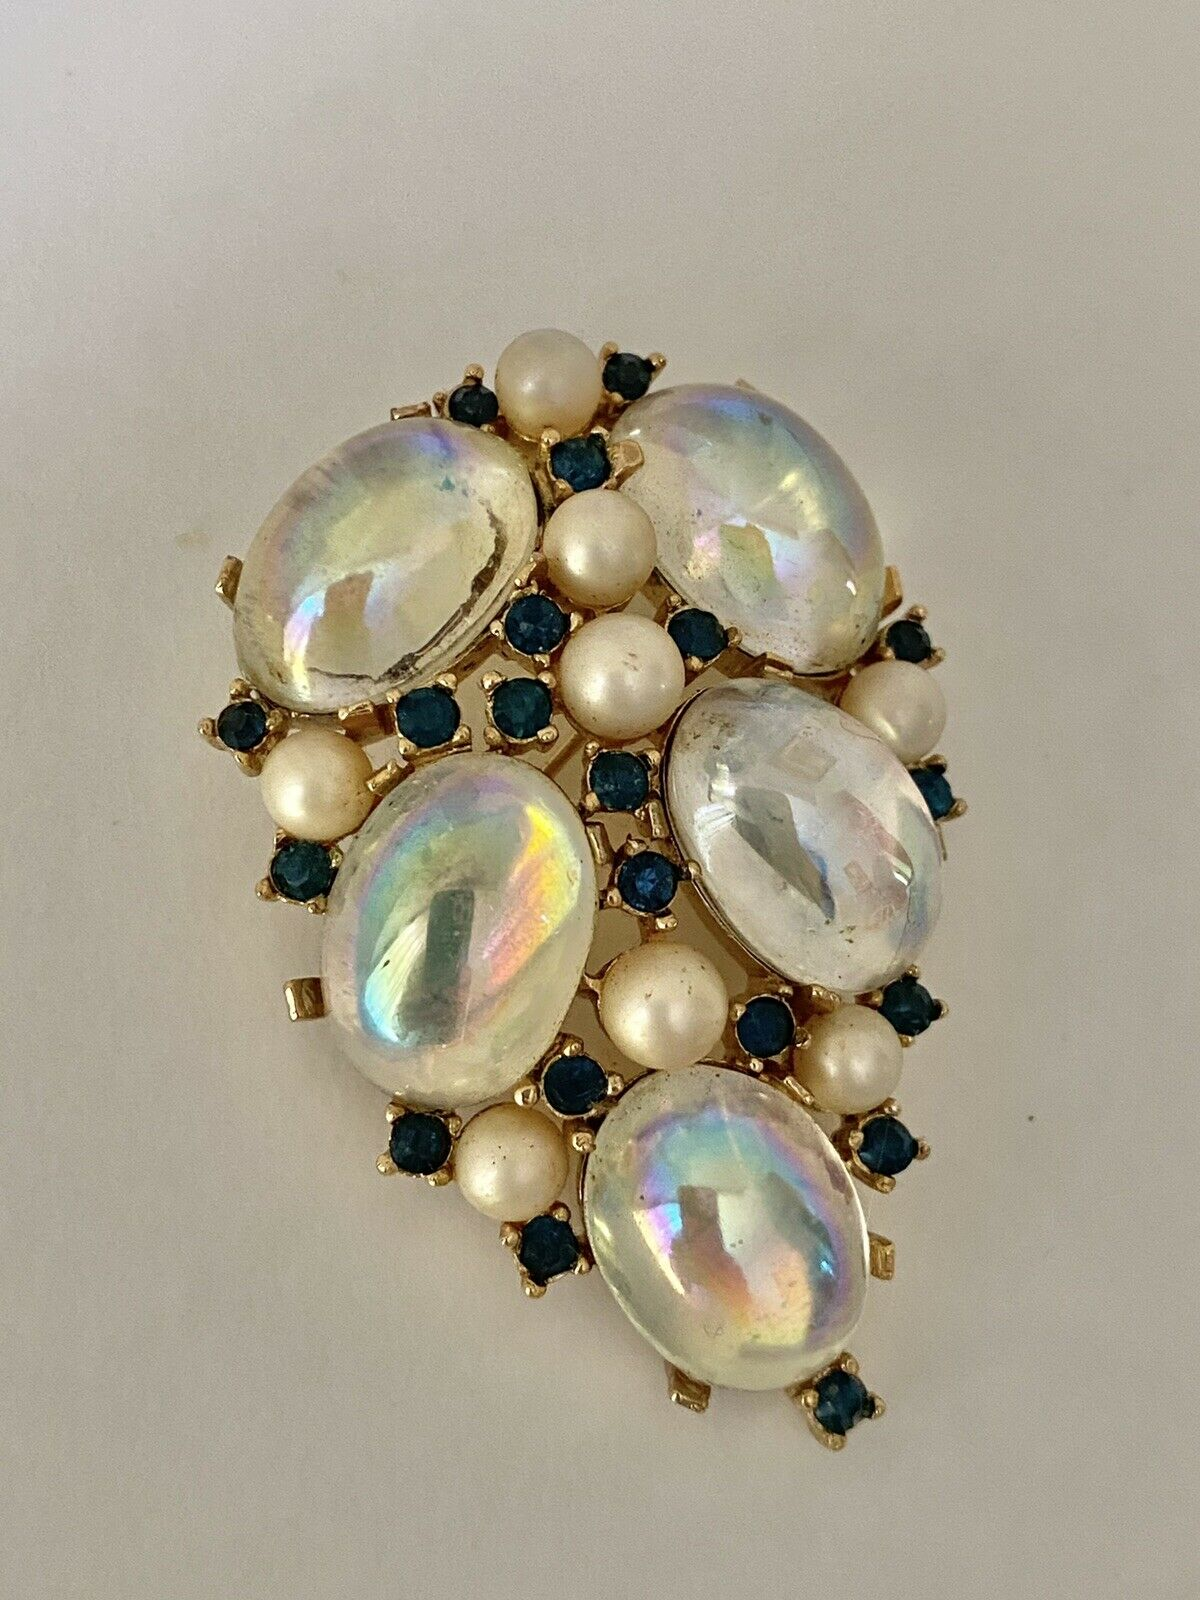 Trifari Sapphire & Pearl Brooch 1950s/60s - image 2